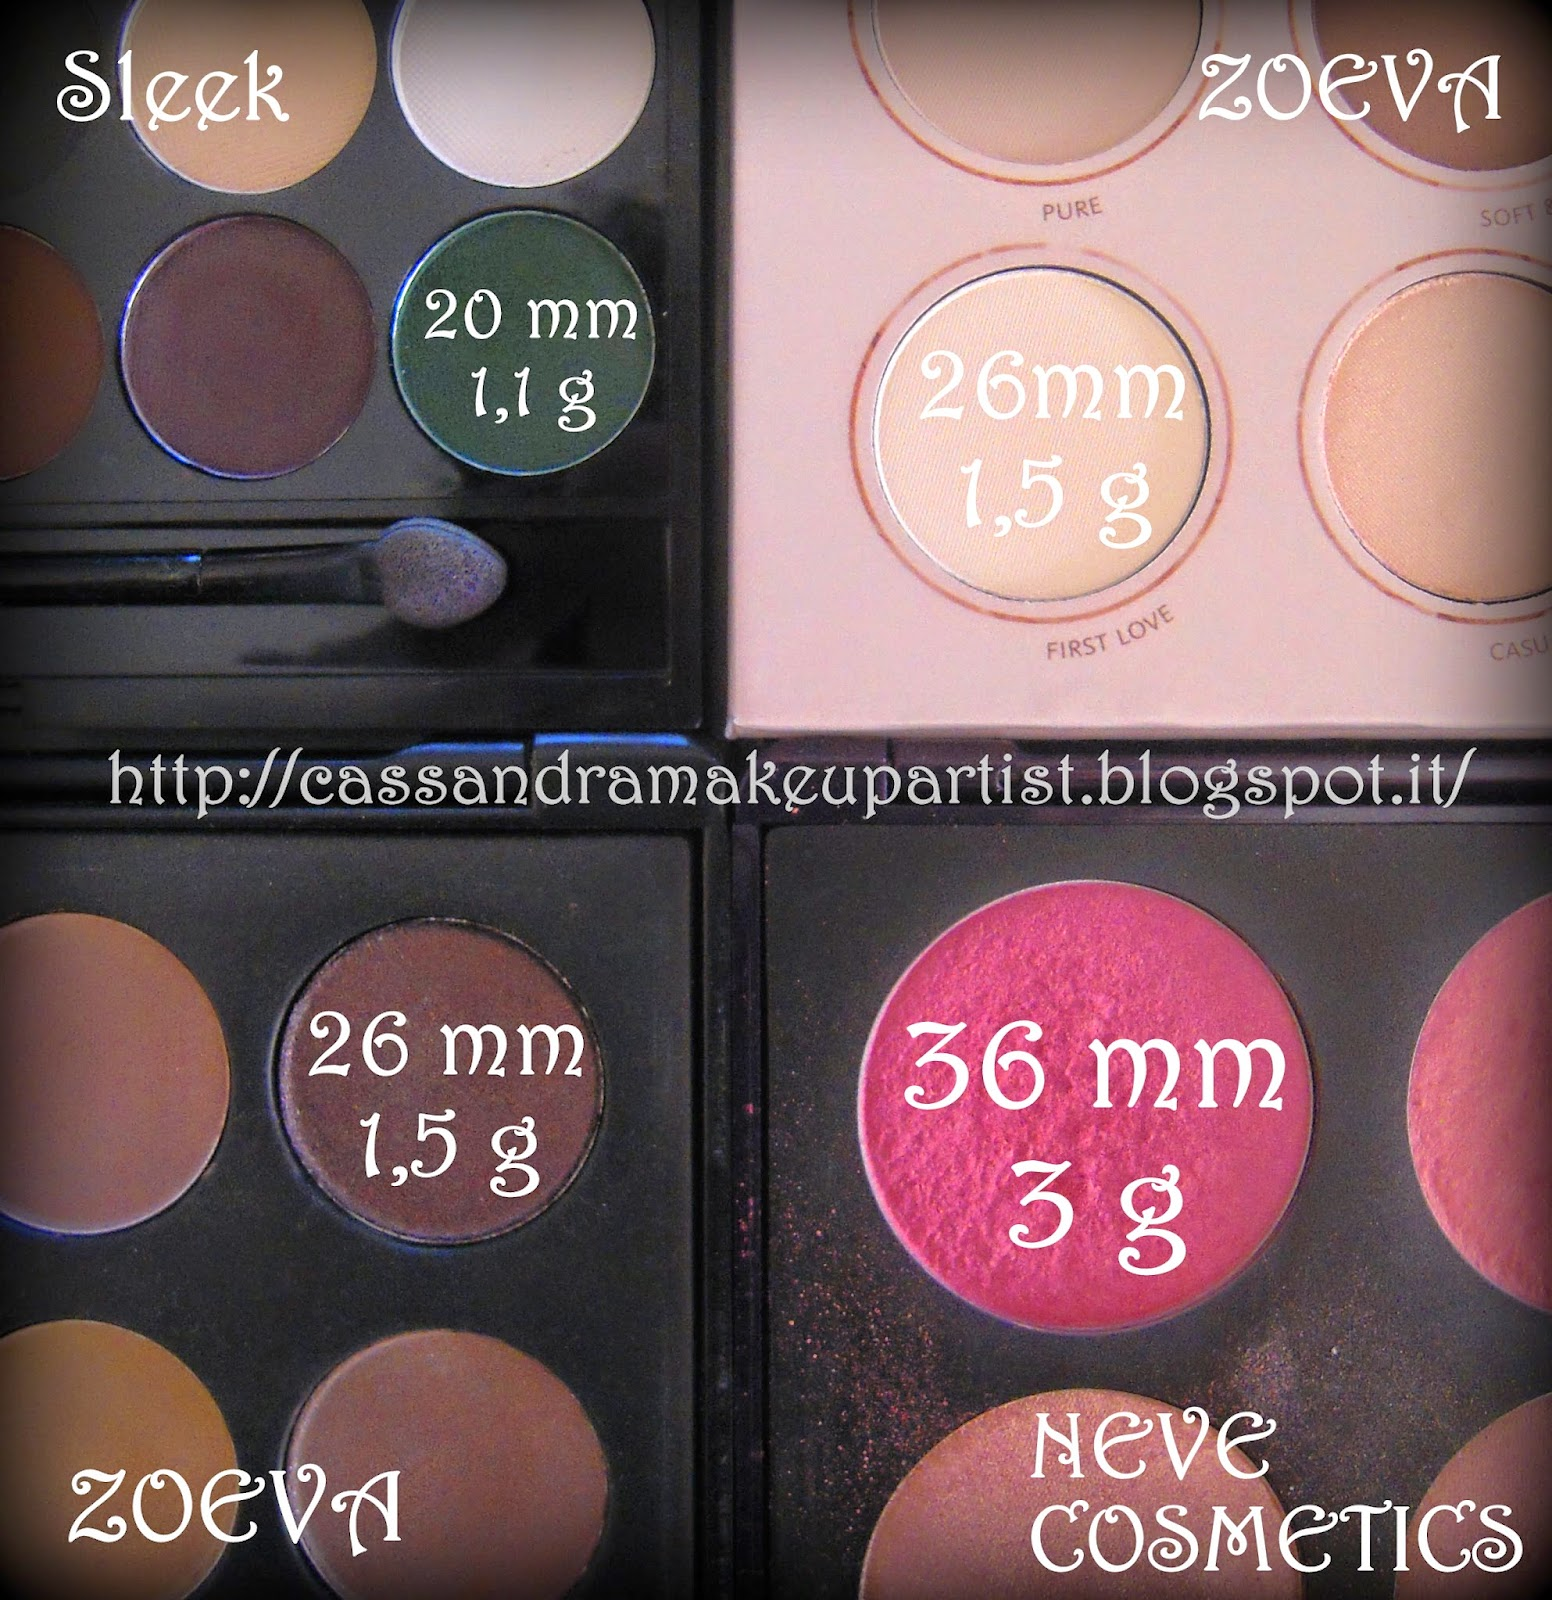 Palette a confronto: sleek - neve arcobaleni - zoeva